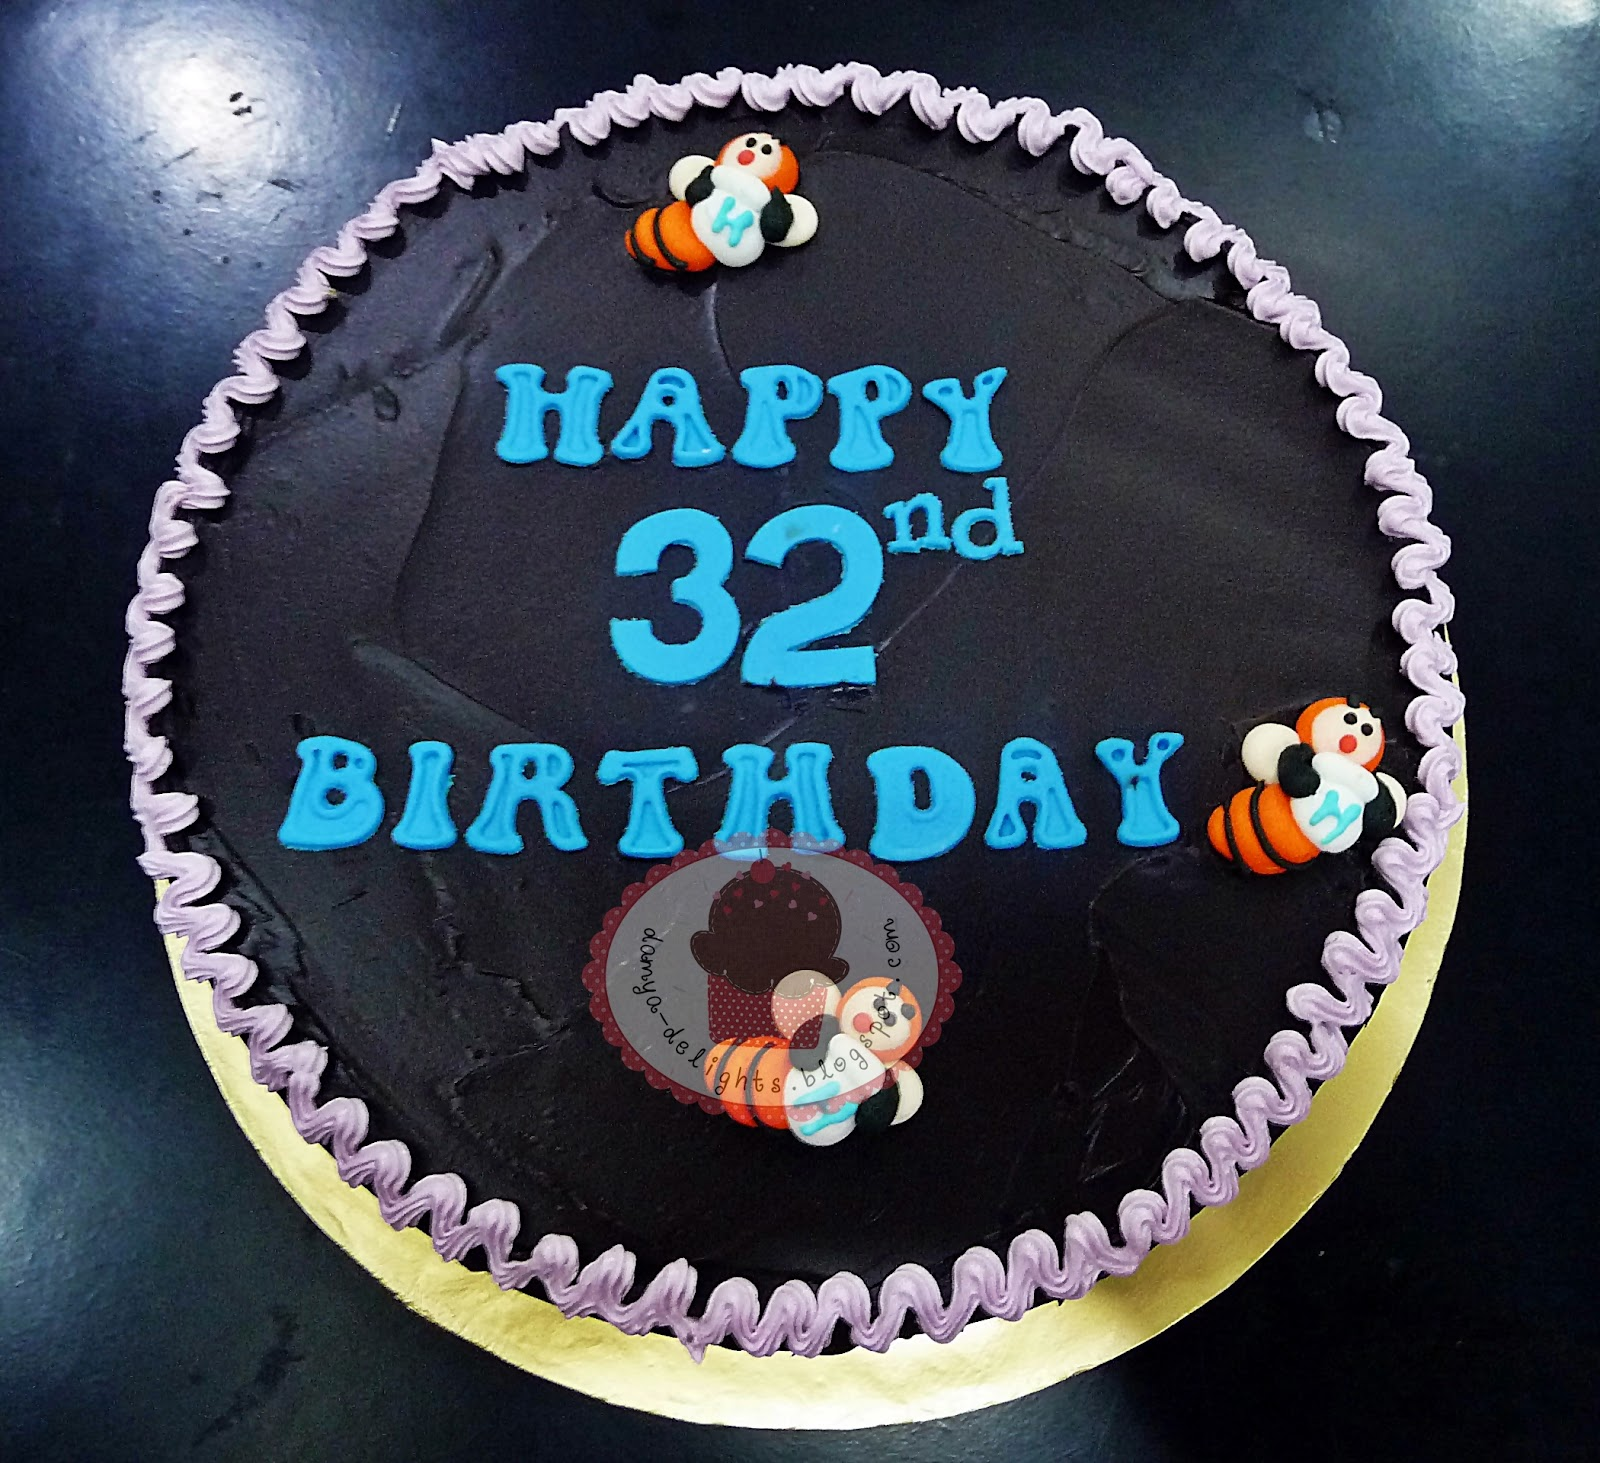 Happy birthday Mudflap